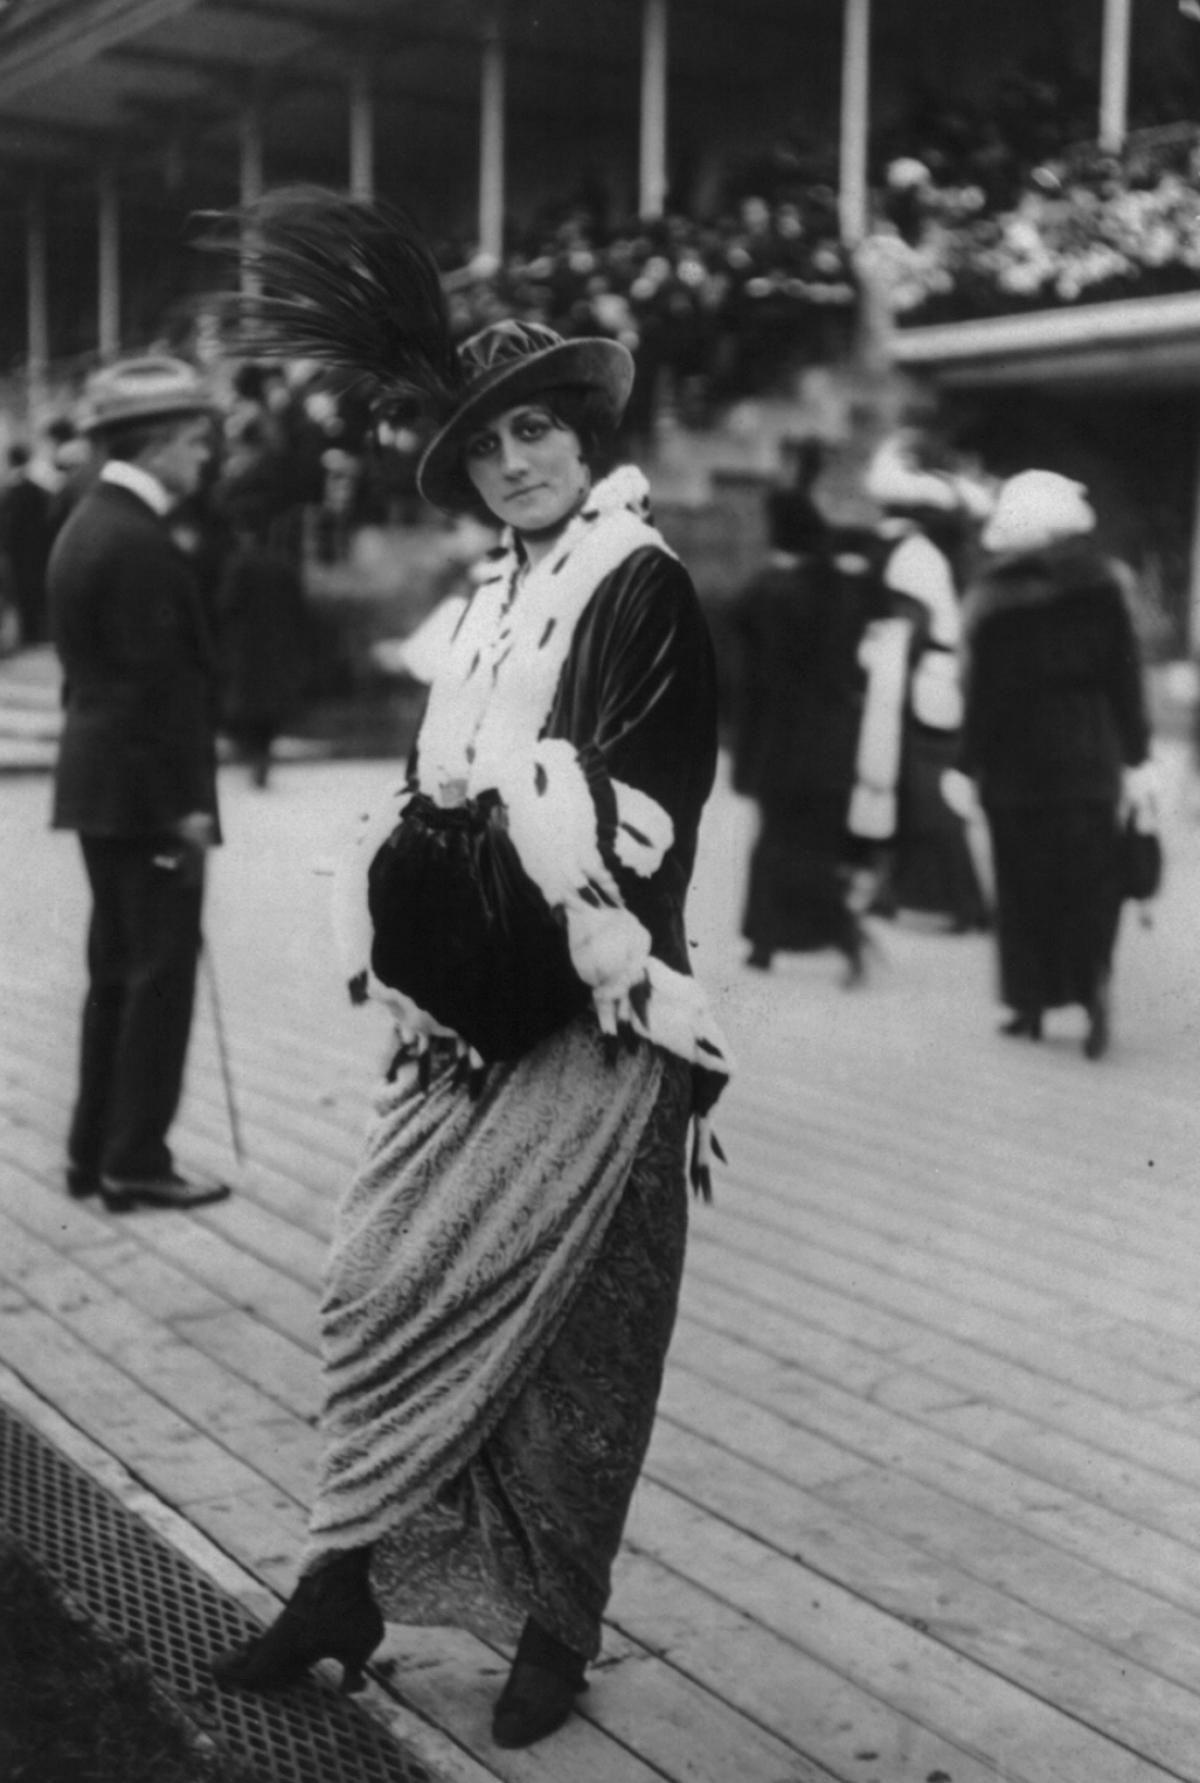 1913 ensemble with ermine trim